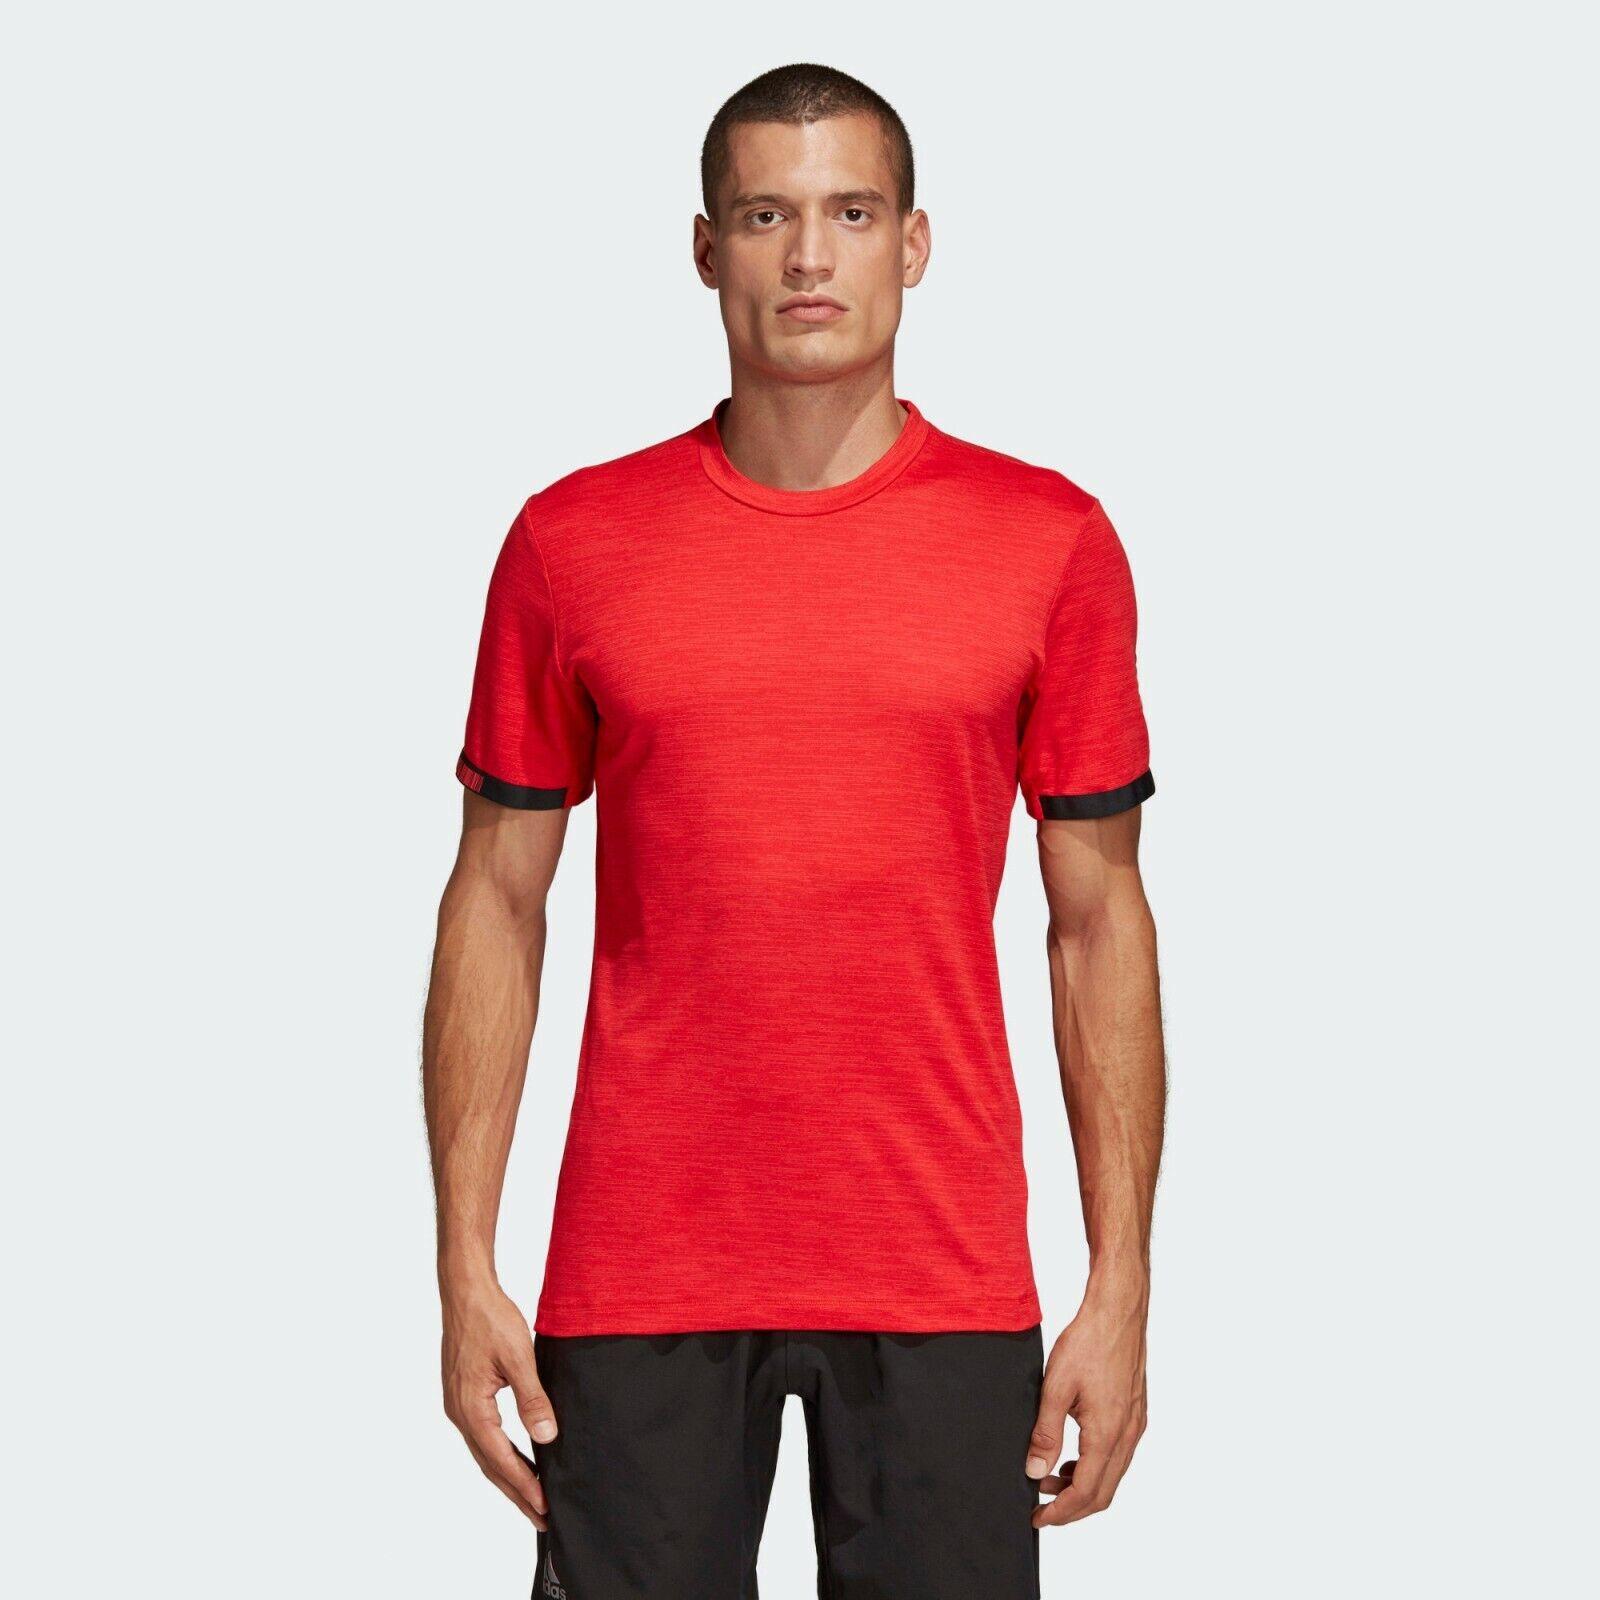 Adidas MatchCode Tee Mens rot Heatherot Solid Active Wear T-Shirt DT4408